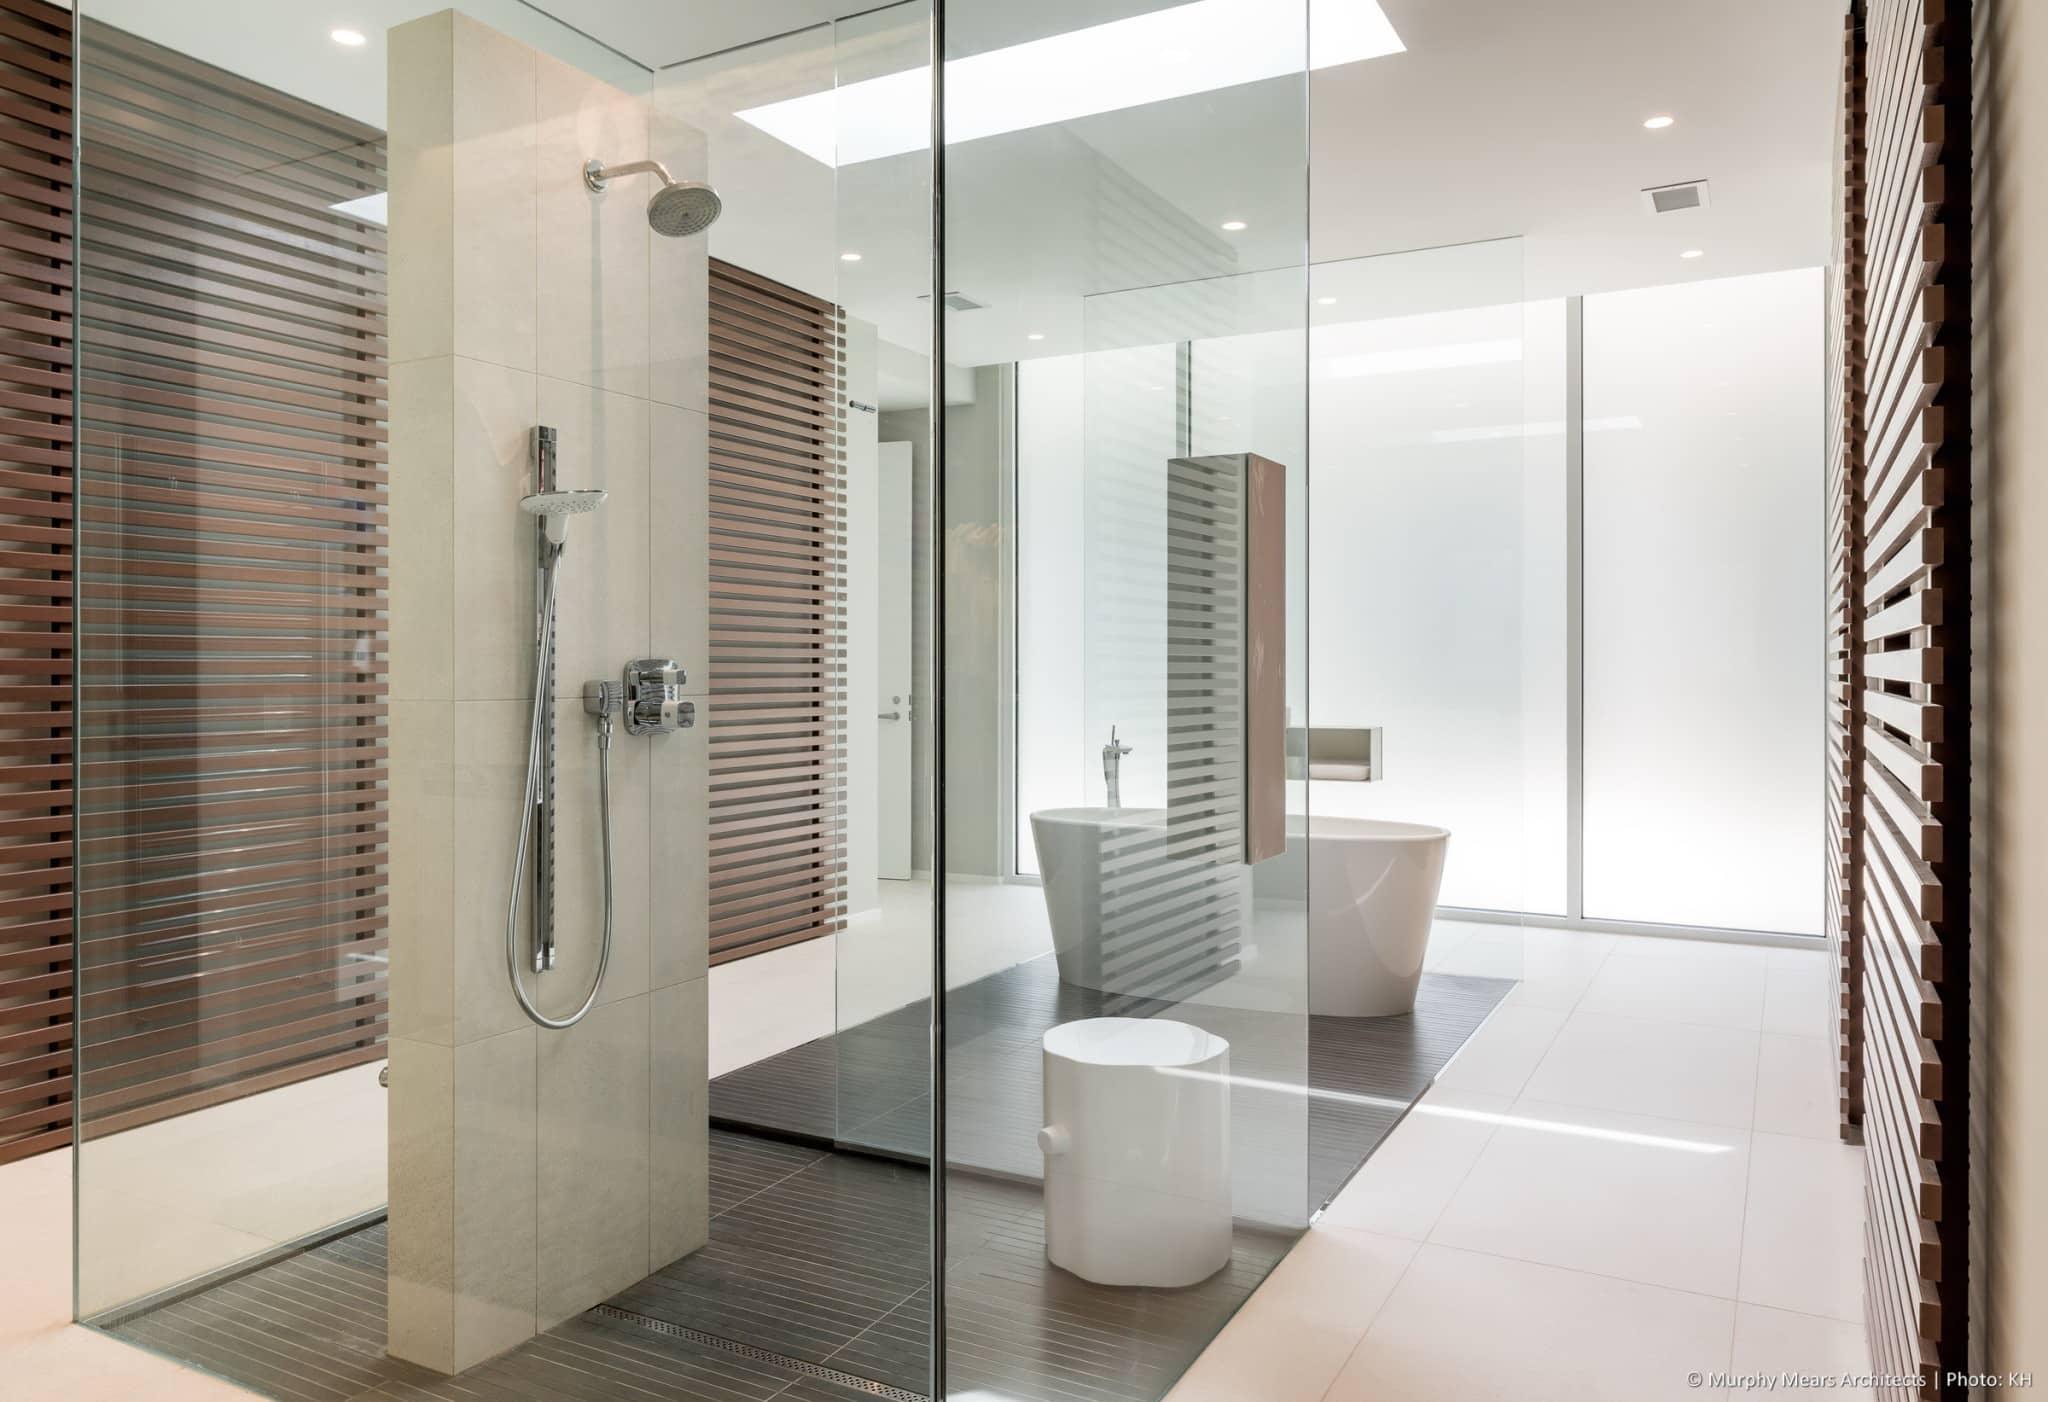 w-mid-century-modern-home-neuhaus-harwood-taylor-renovation-bathroom-glass-shower-skylight.jpg